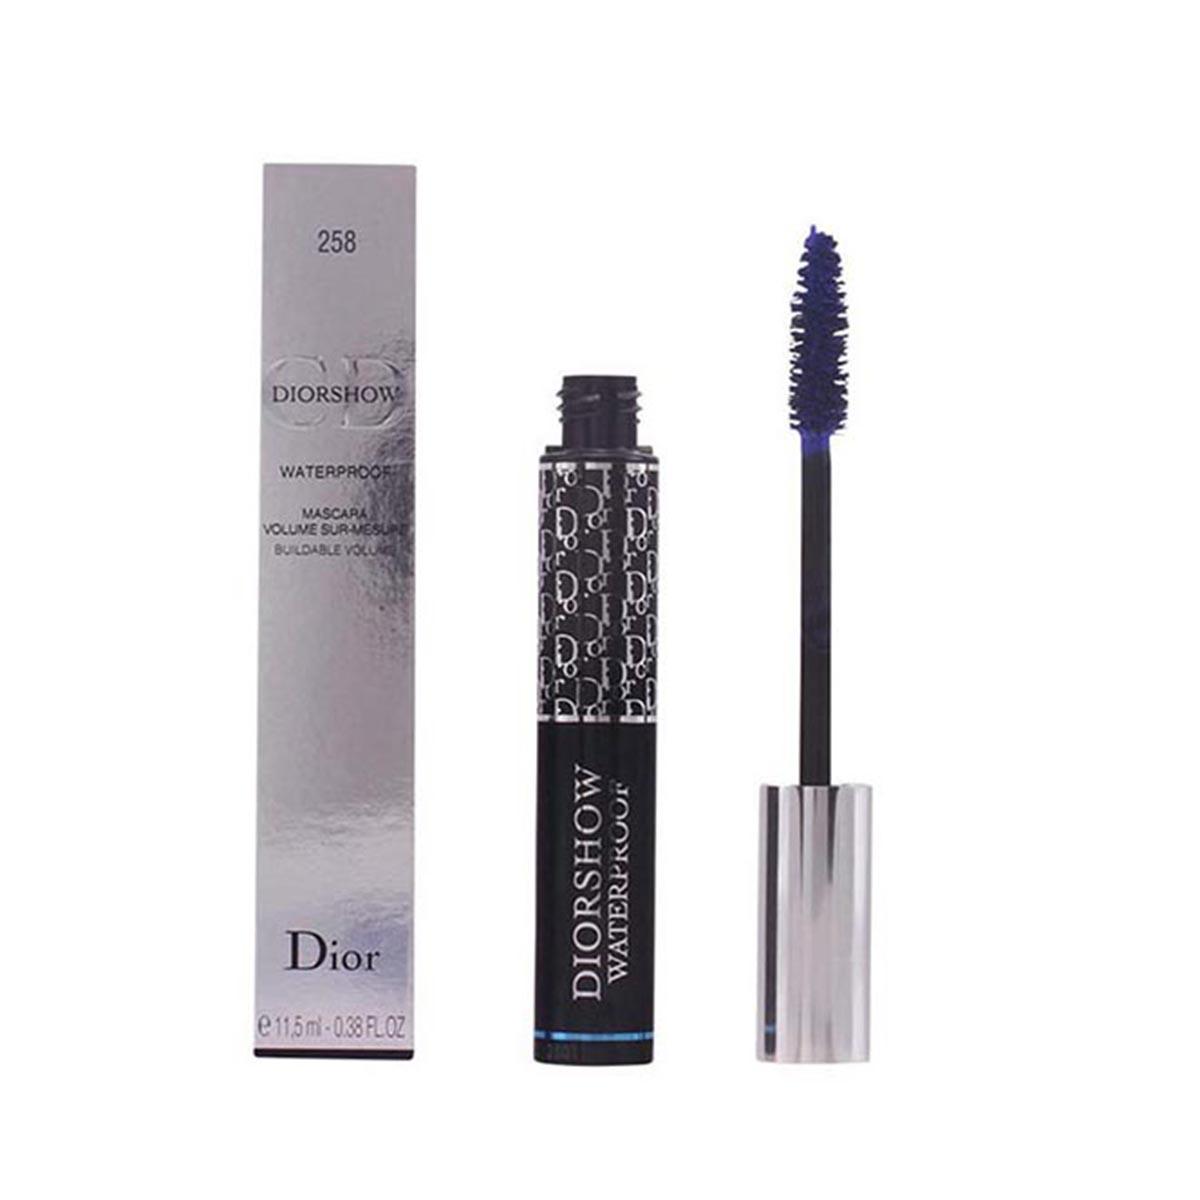 Dior diorshow mascara volume n 258